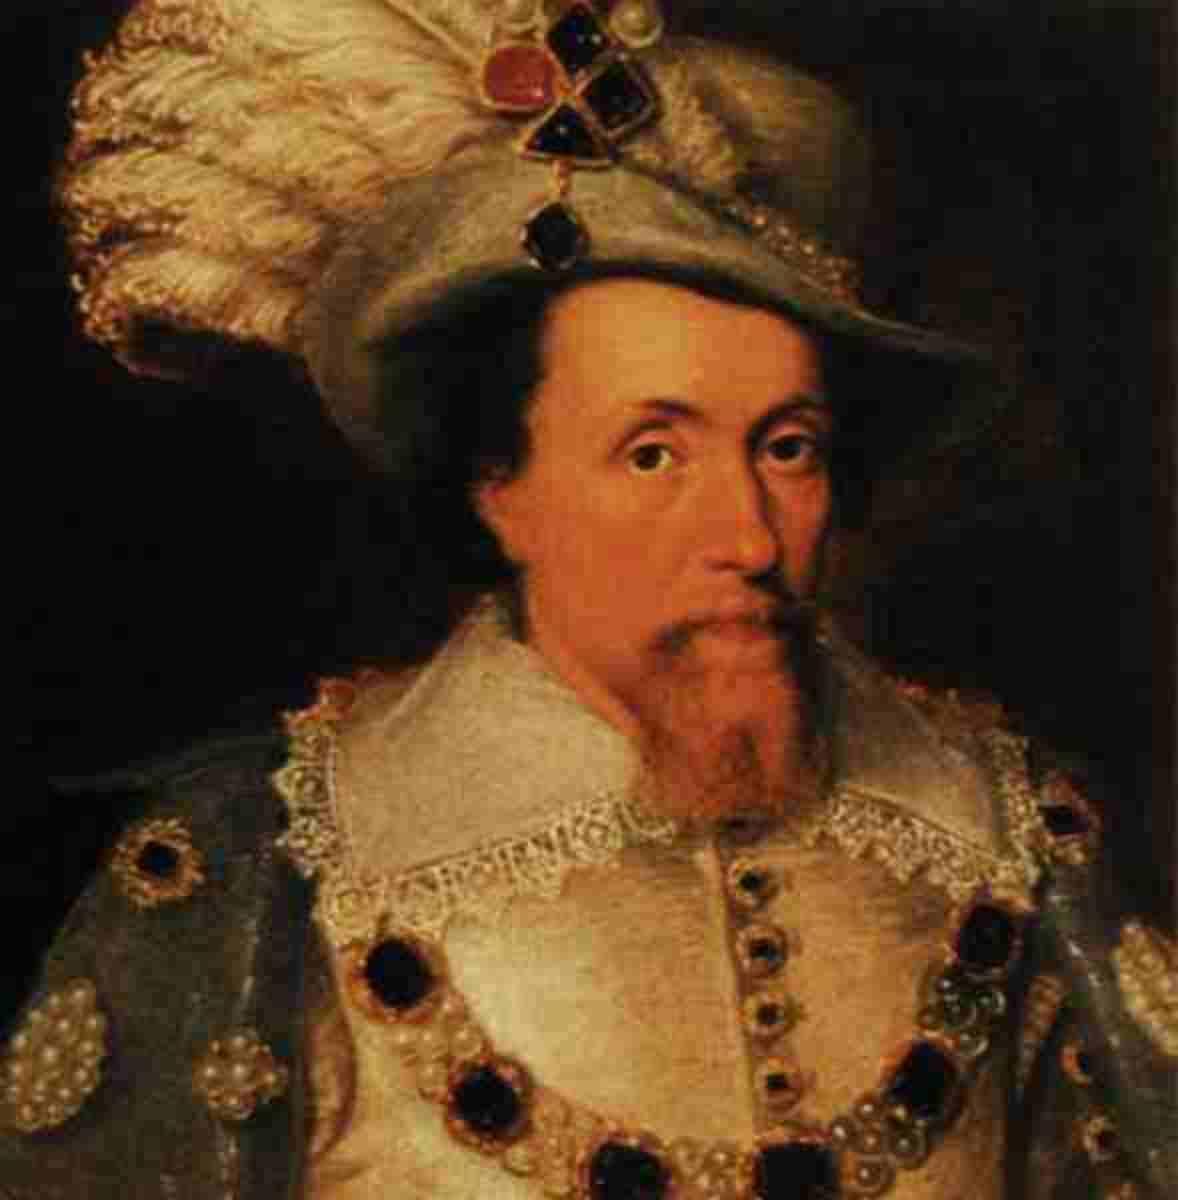 James 1st of Scotland and VI of England